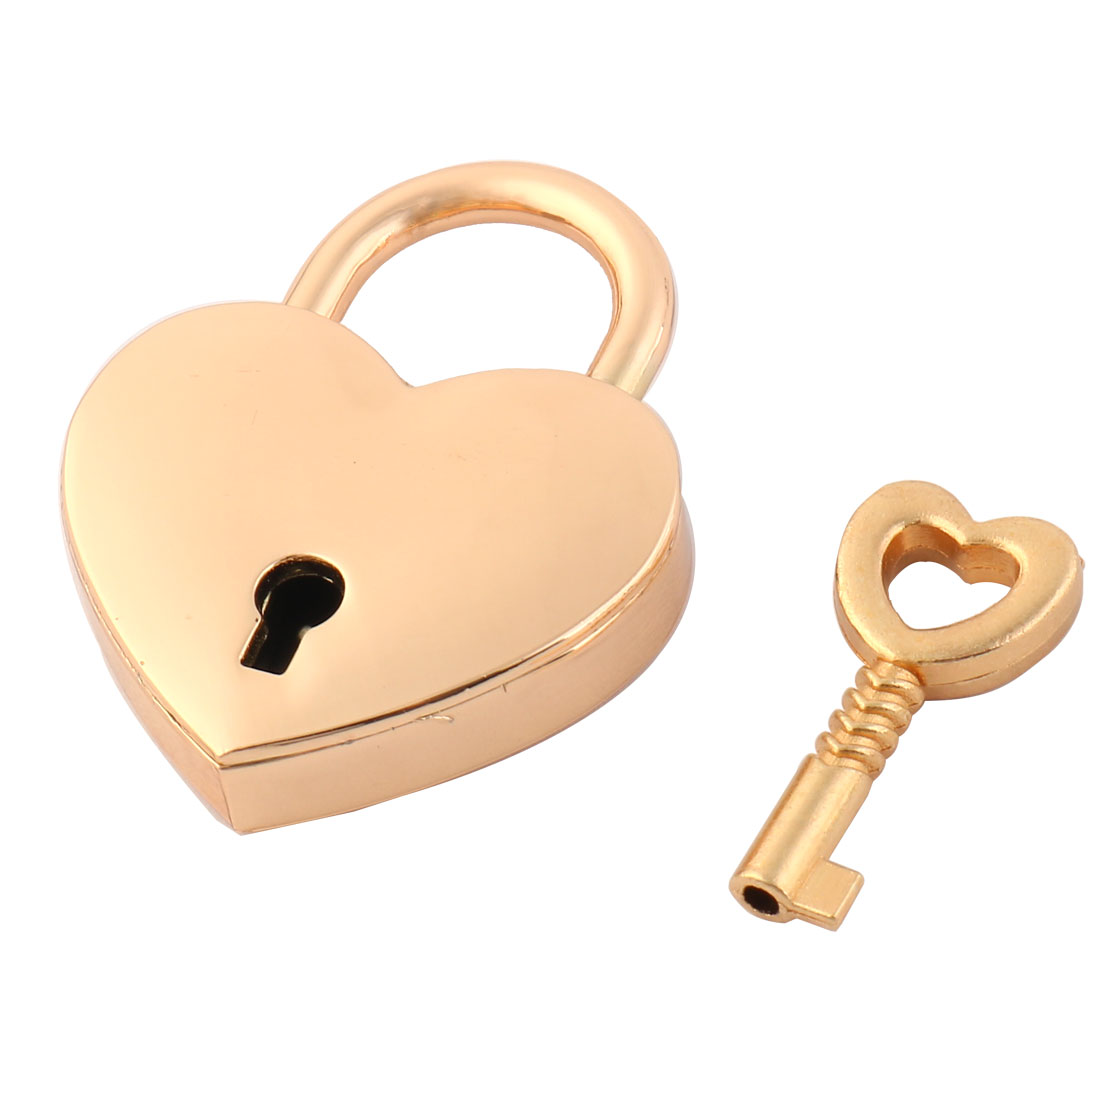 Luggage Bag Metal Heart Shaped Security Lock Padlock Gold Tone w